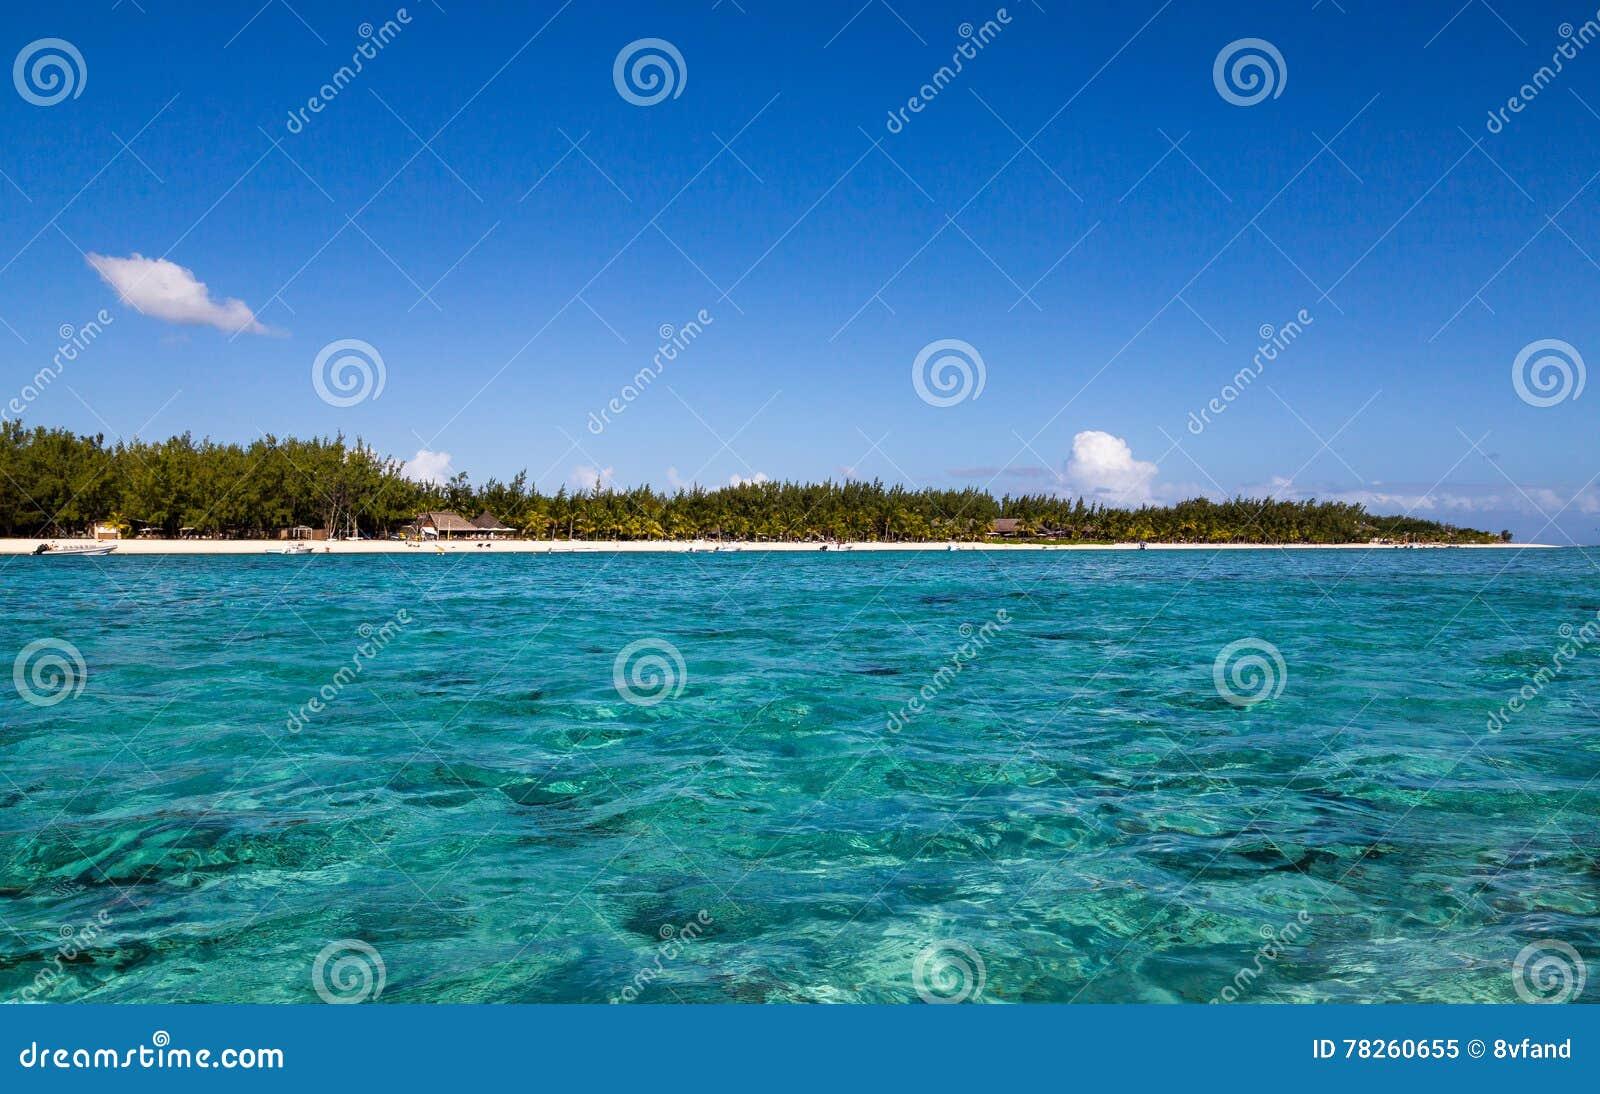 LE Morne Μαυρίκιος με τη θάλασσα πανοραμική